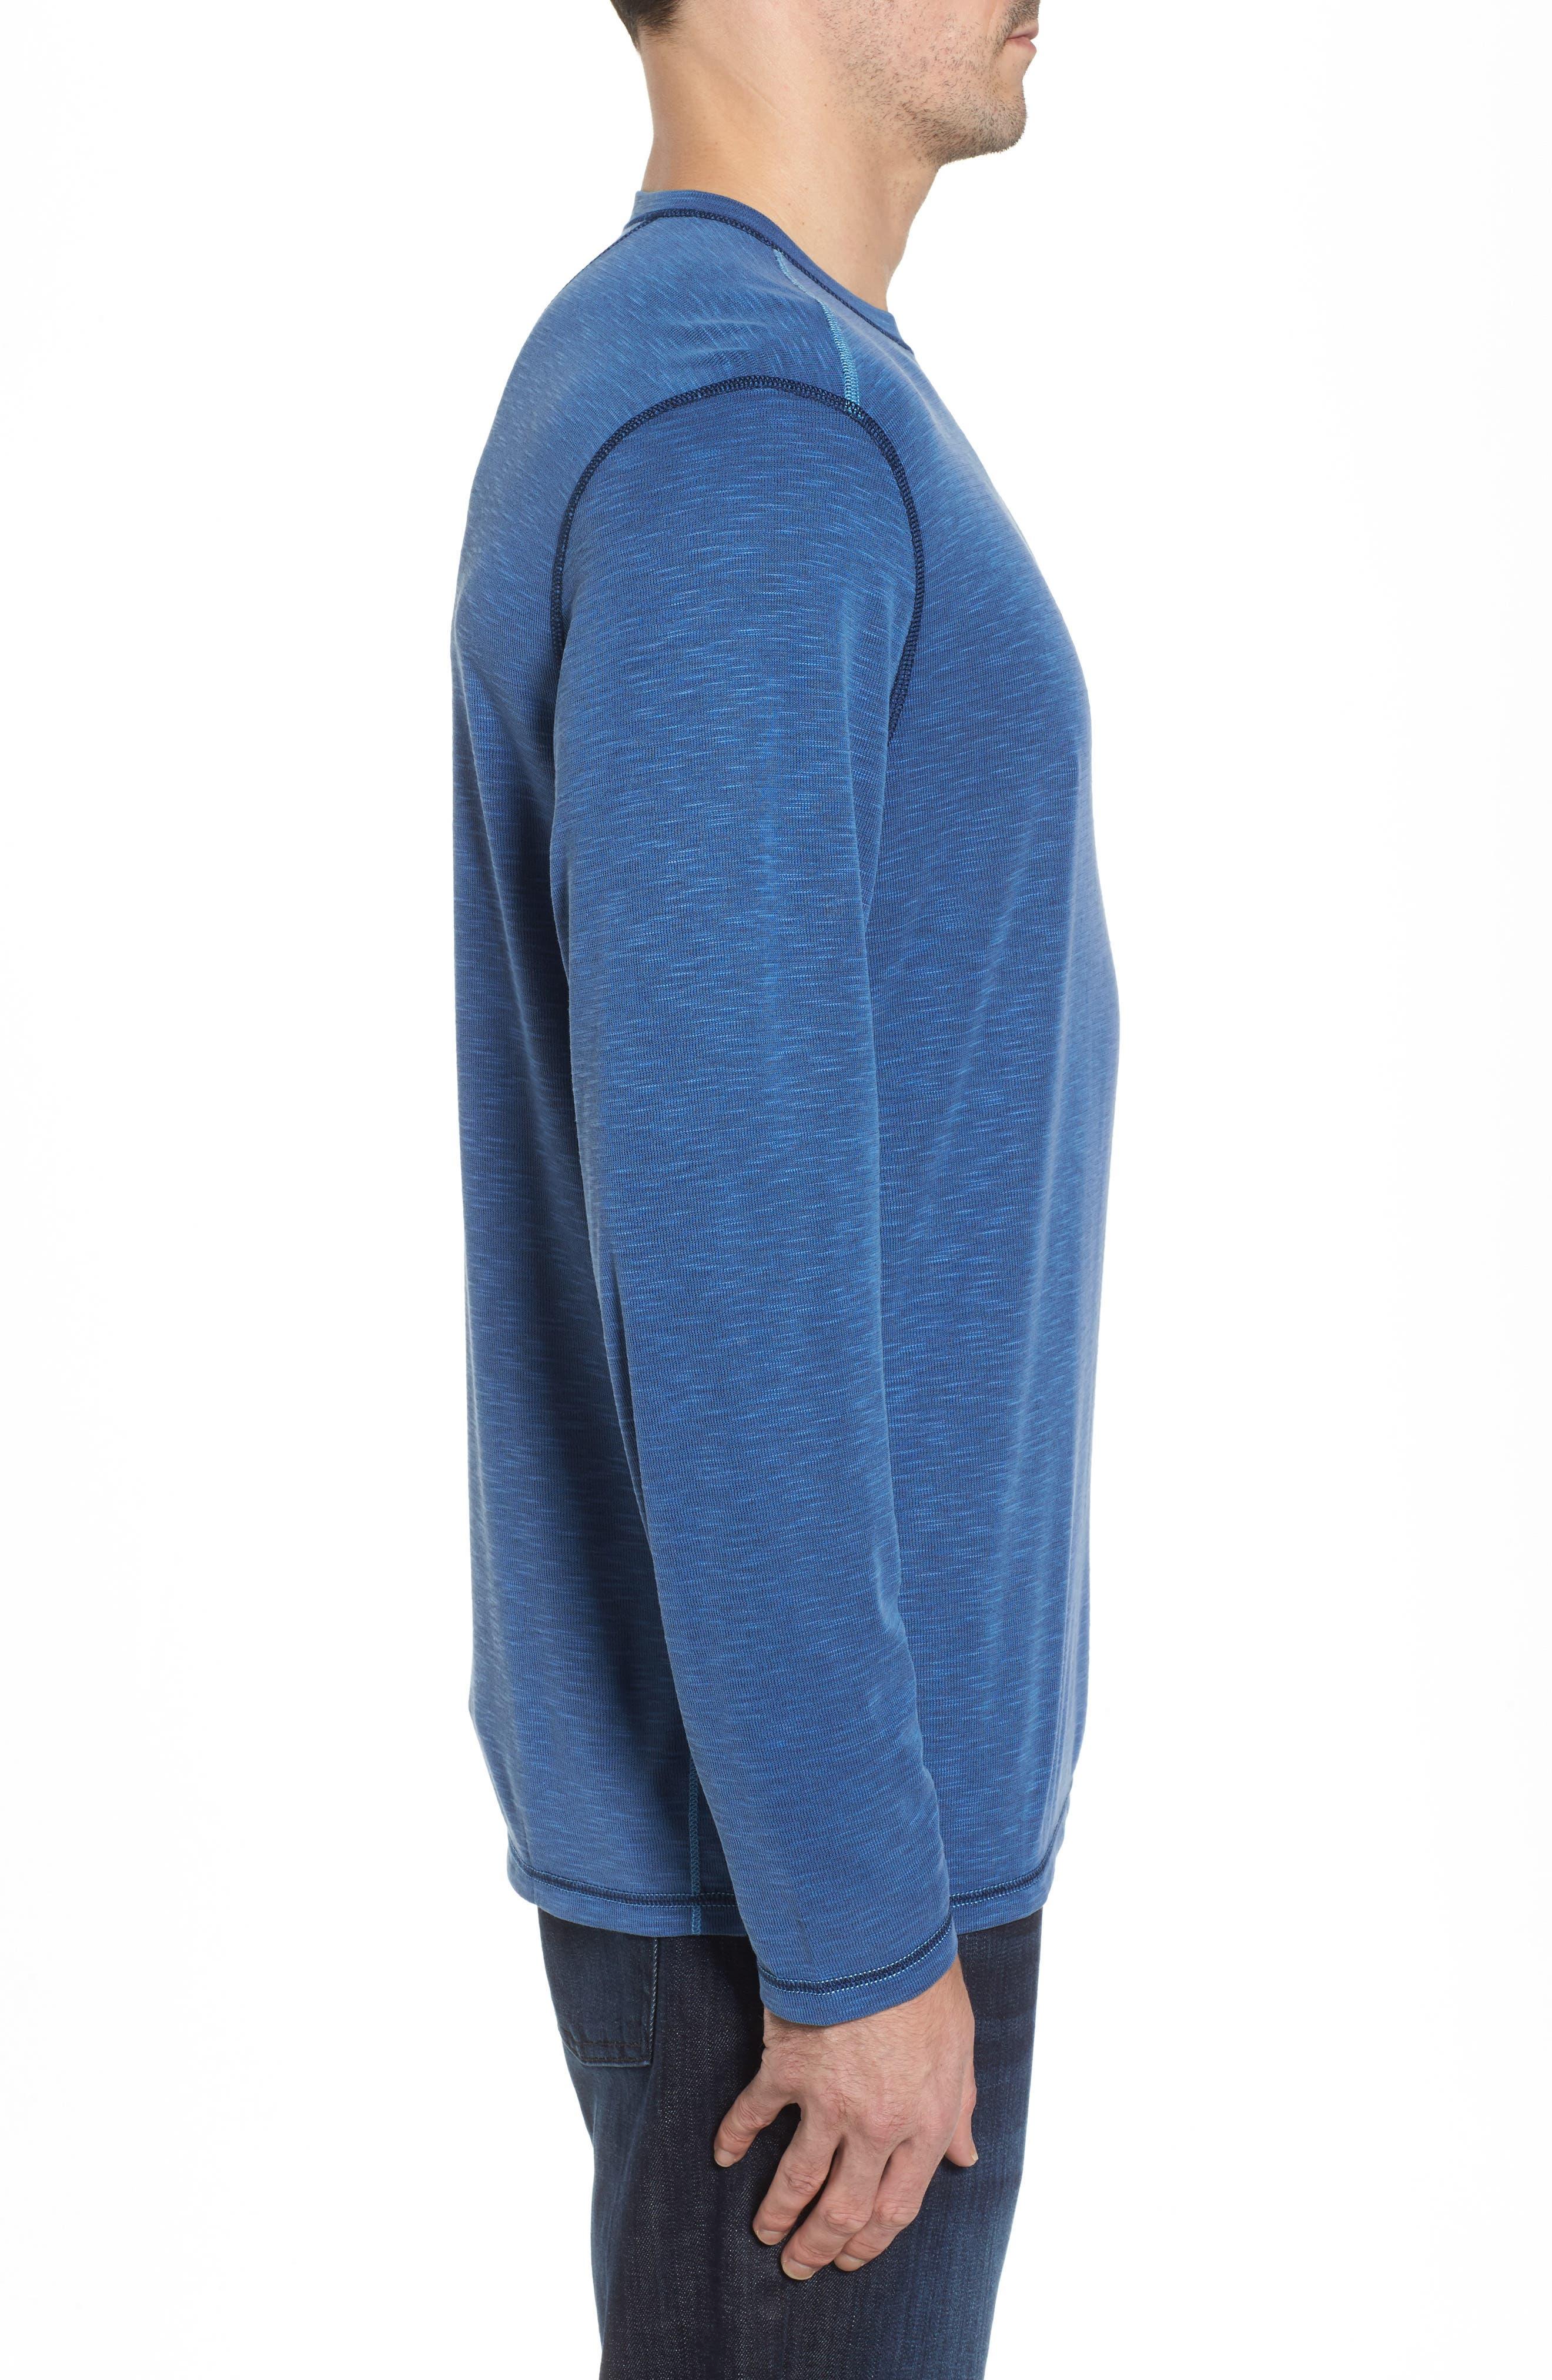 Flip Tide Standard Fit T-Shirt,                             Alternate thumbnail 4, color,                             GALAXY BLUE